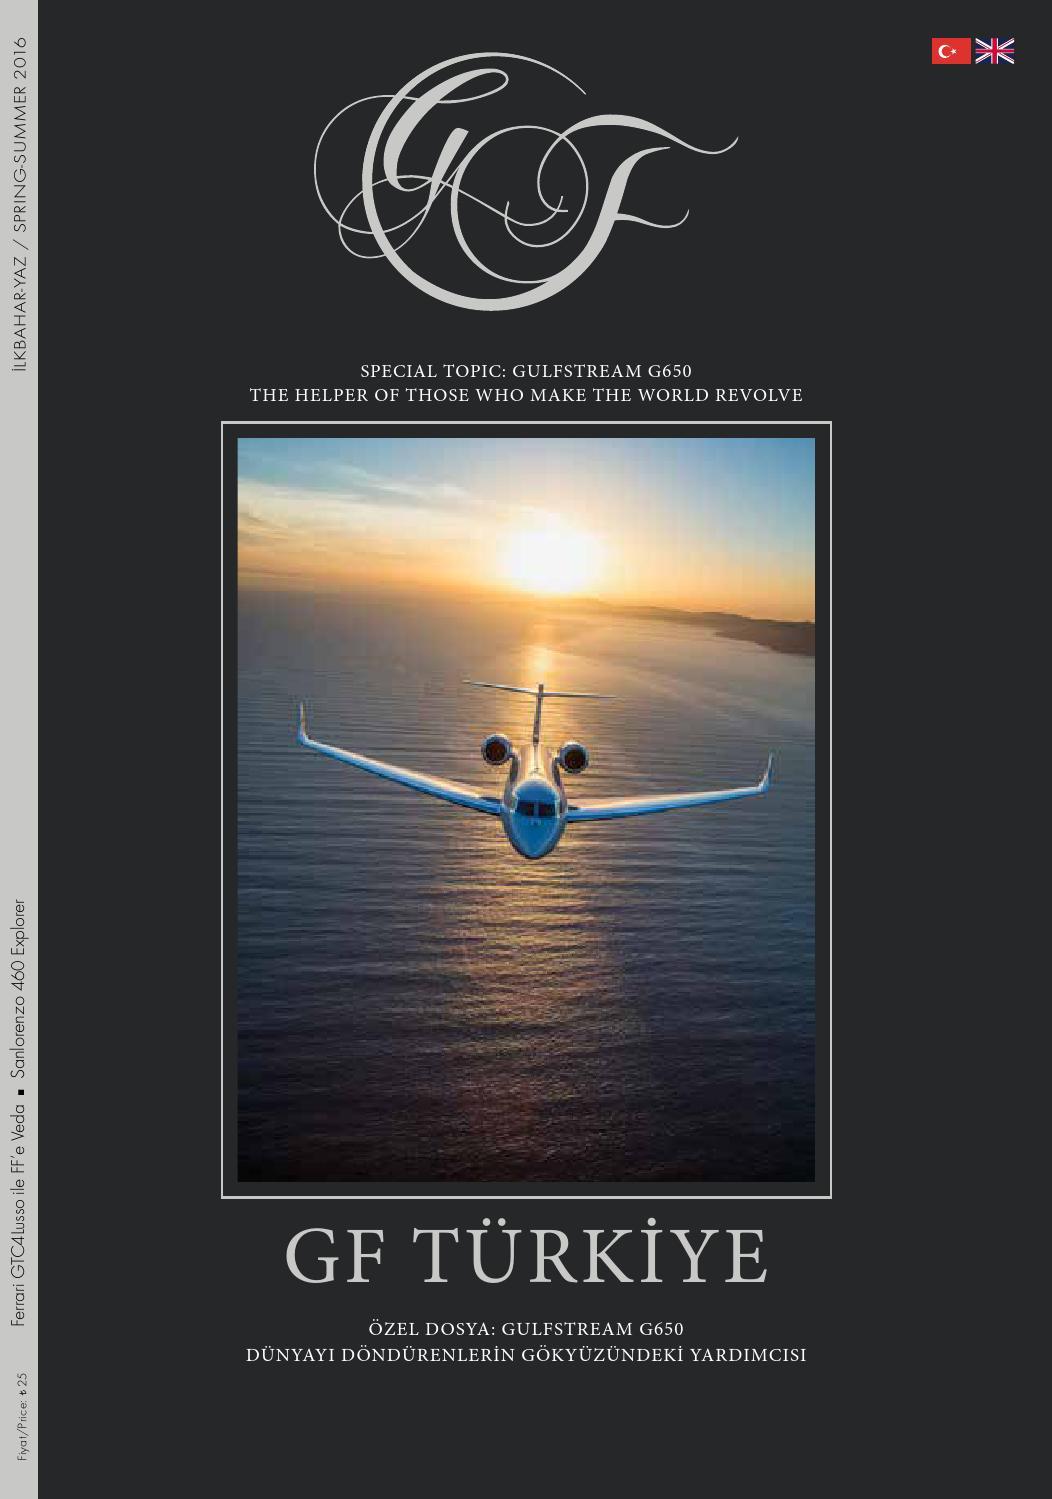 Gf Türkiye For Connaisseurs Spring Summer 2016 By Gf Luxury Issuu